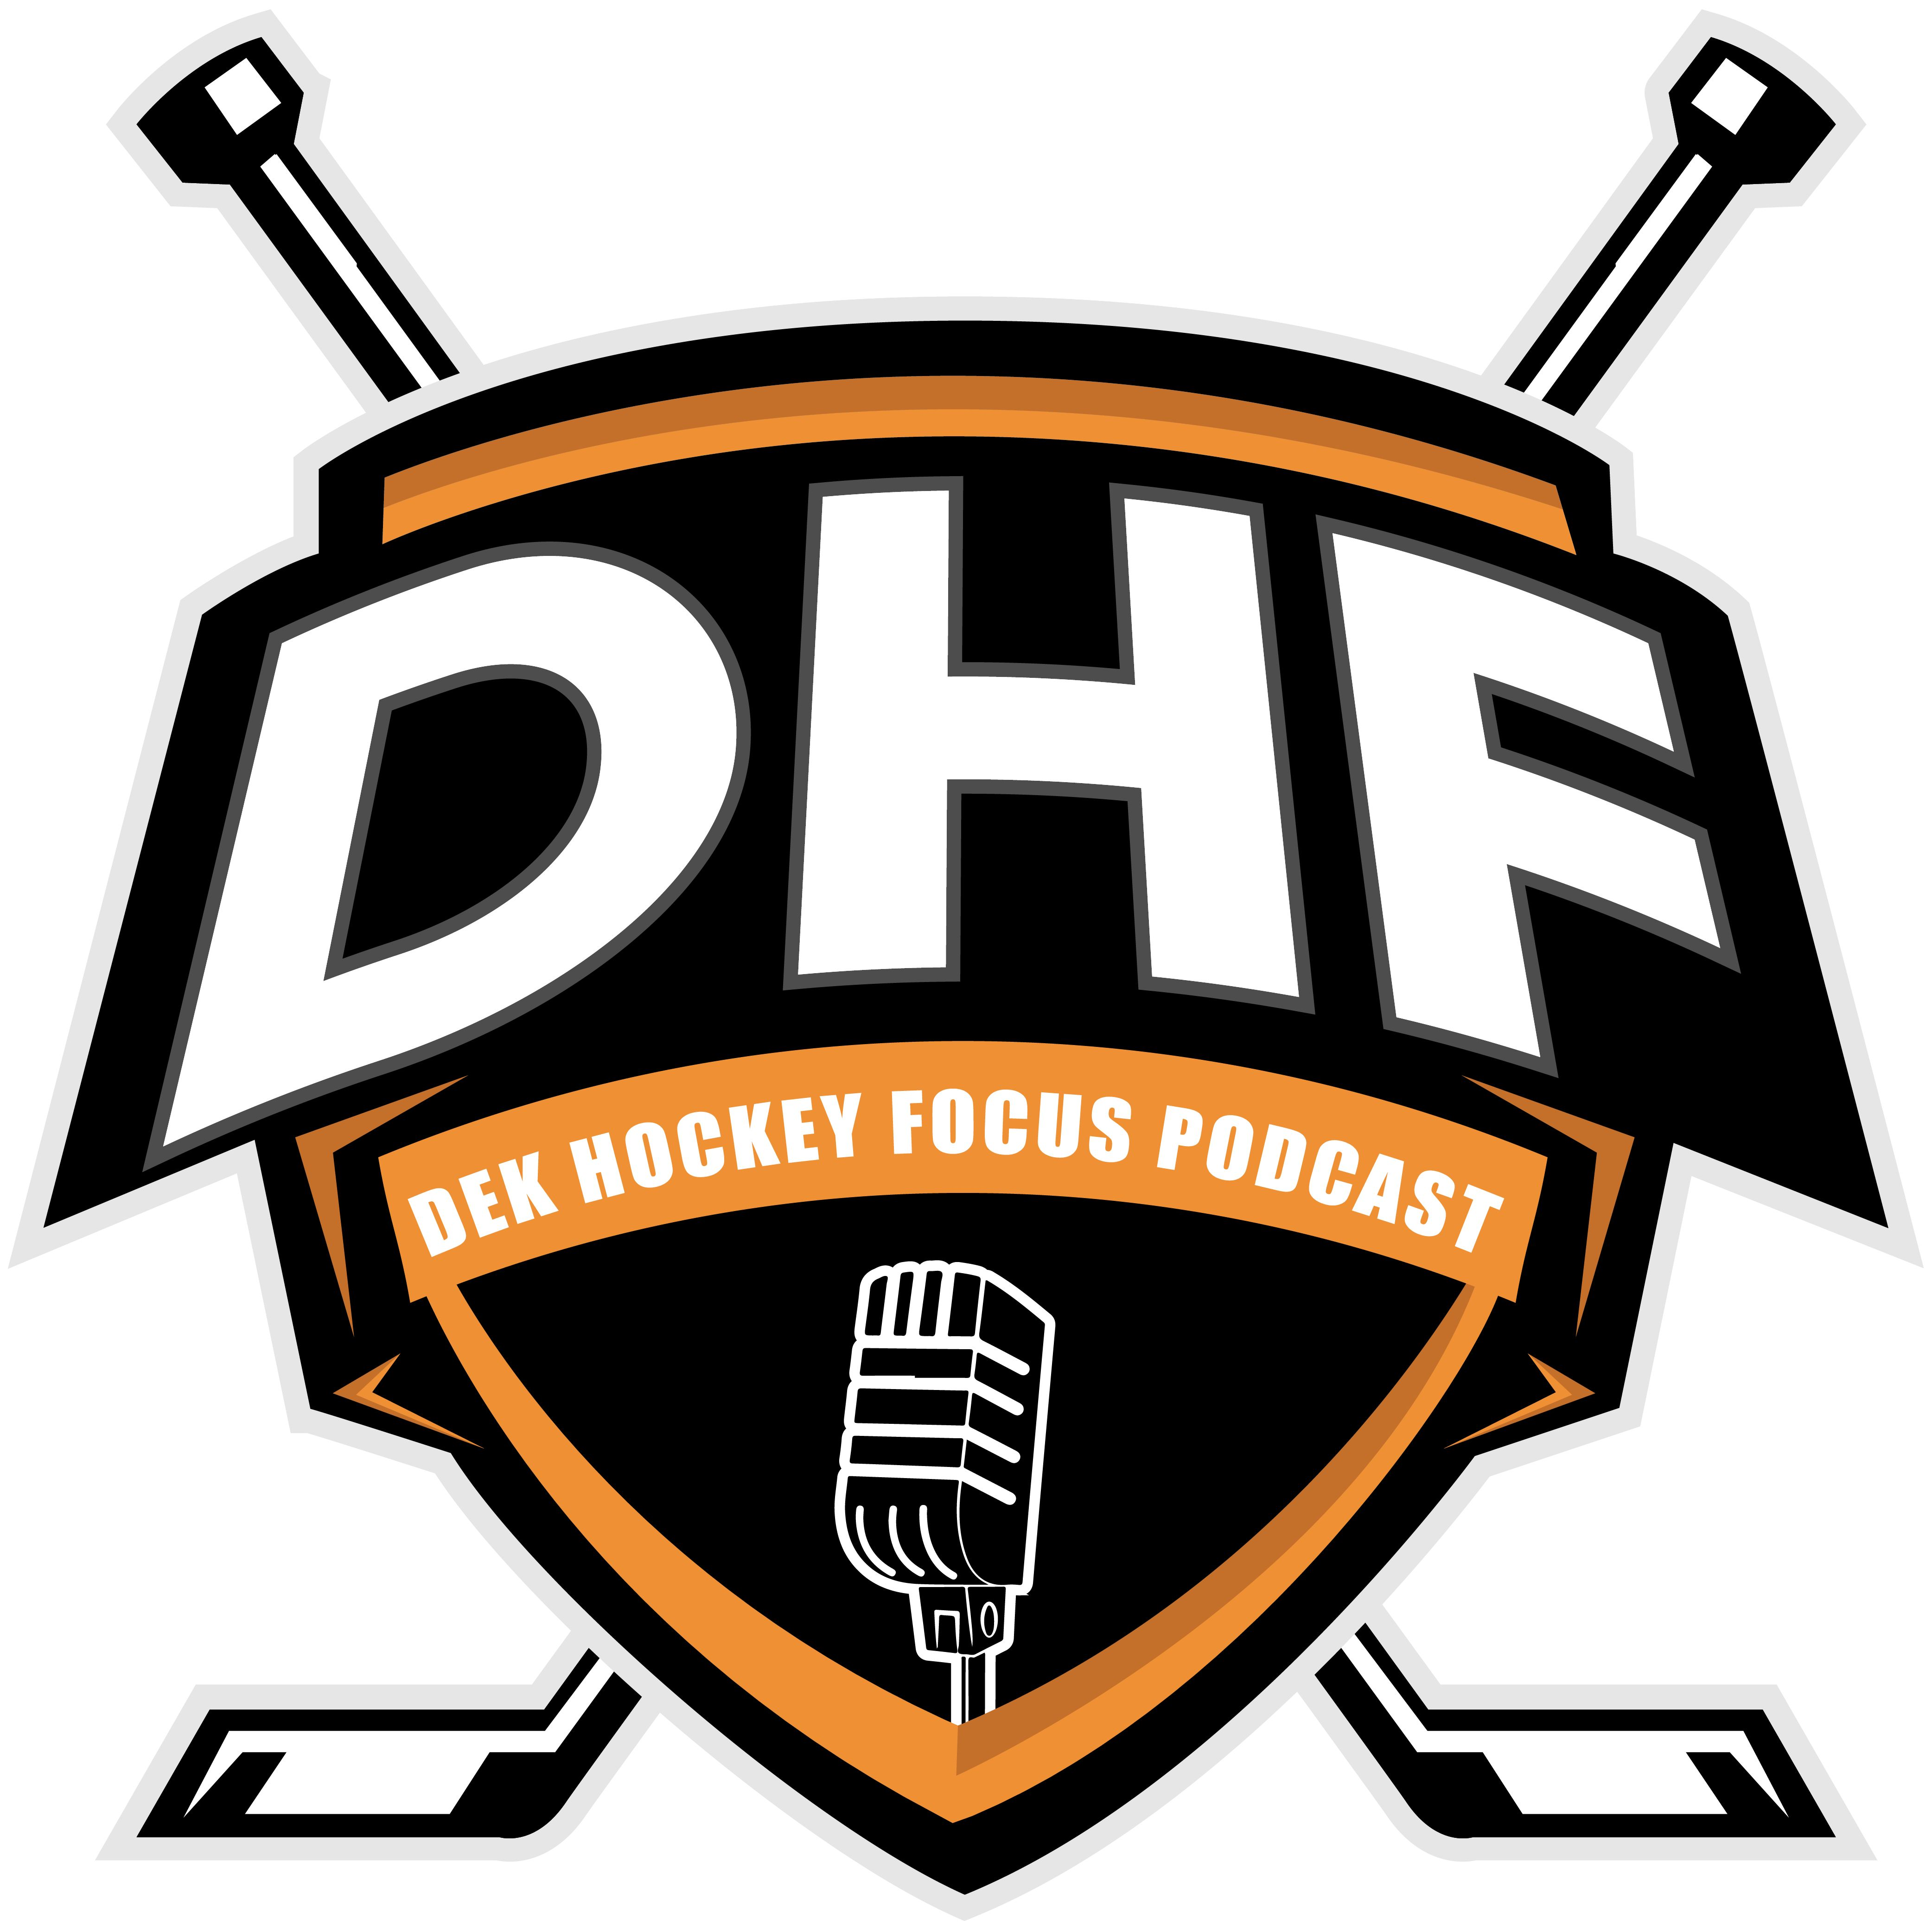 Dek Hockey Focus | Free Listening on SoundCloud